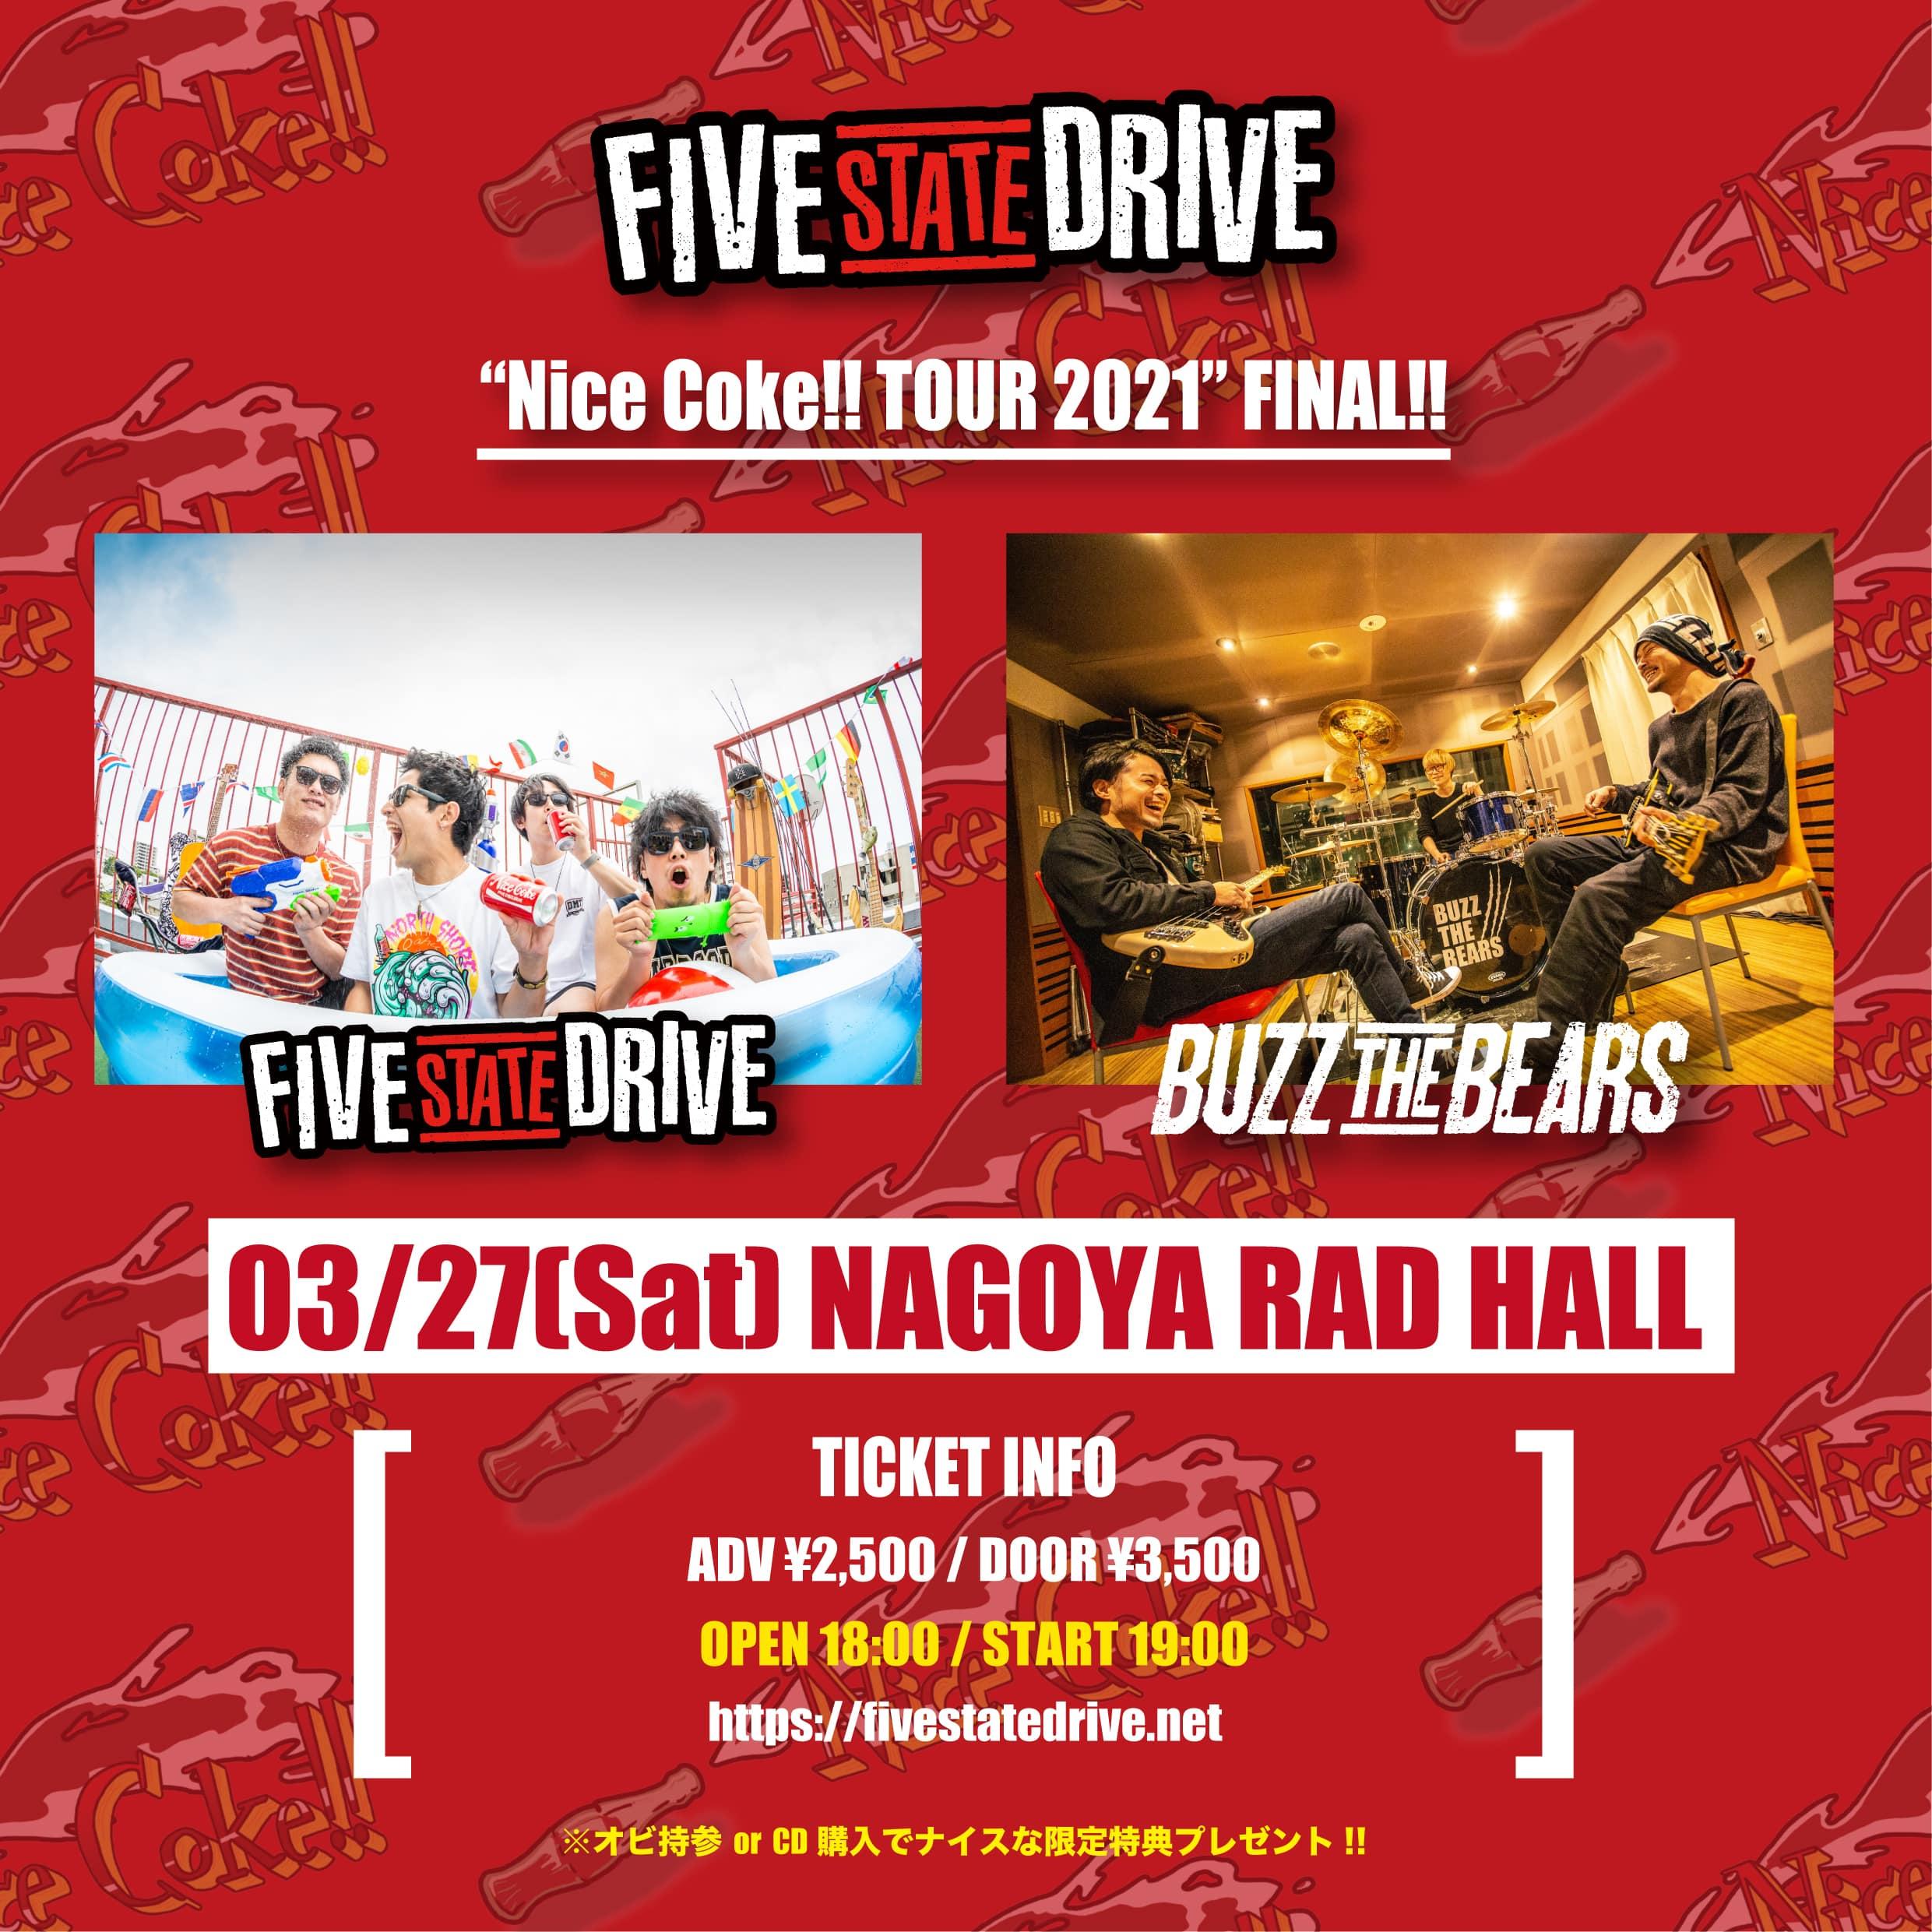 Nice Coke!! TOUR 2021 FINAL